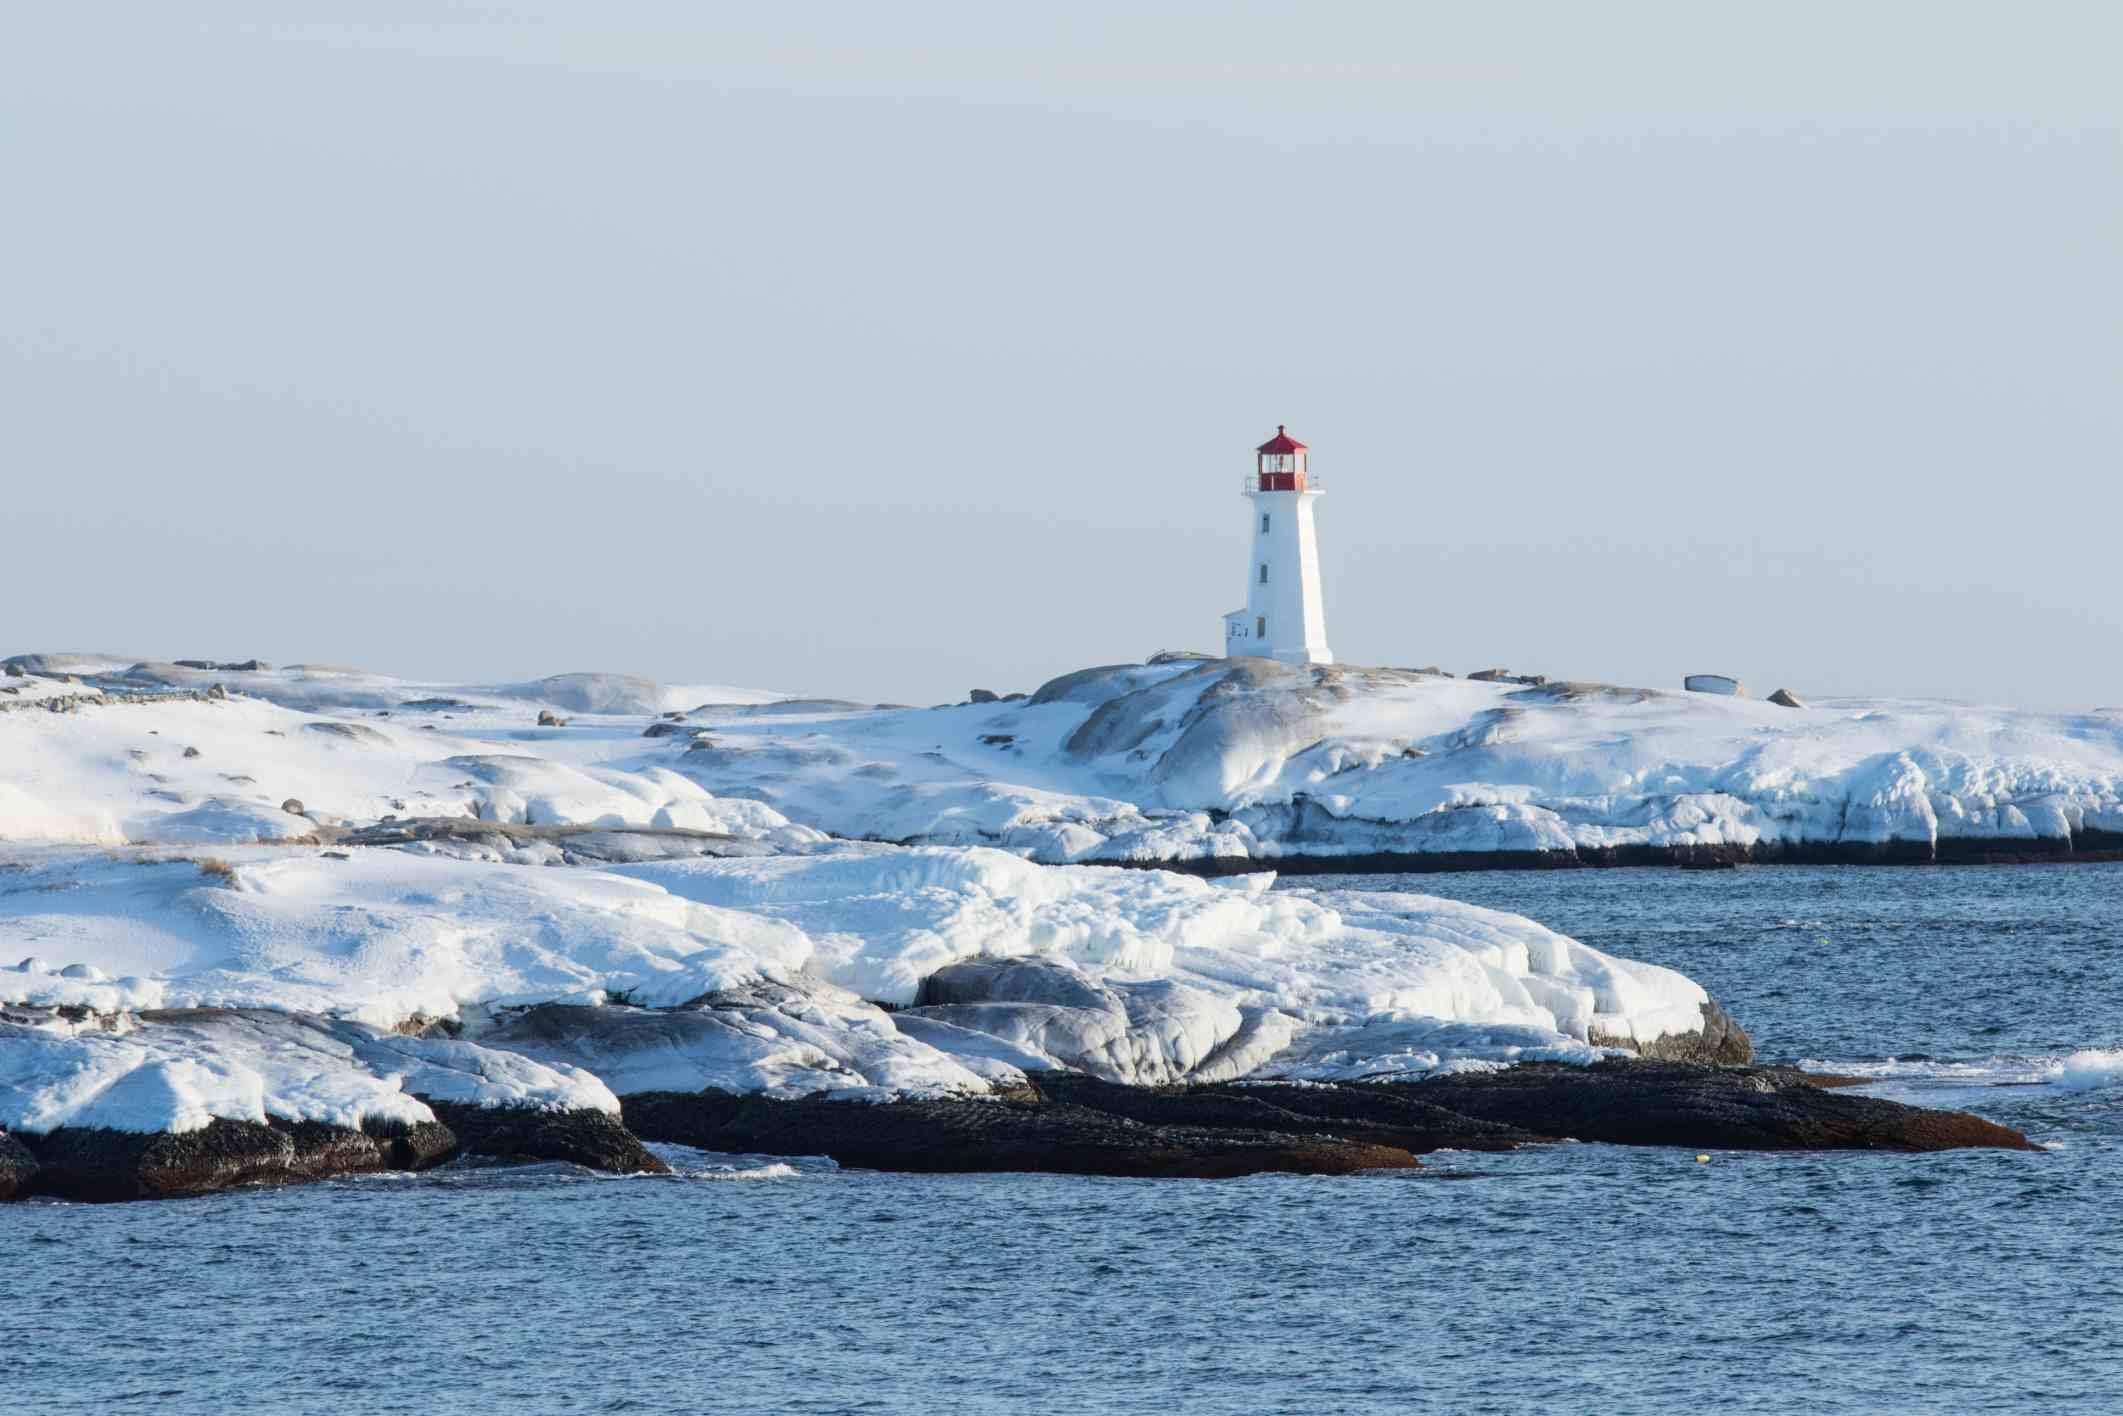 Lighthouse in Nova Scotia, where maritime polar air forms over oceans at high latitudes